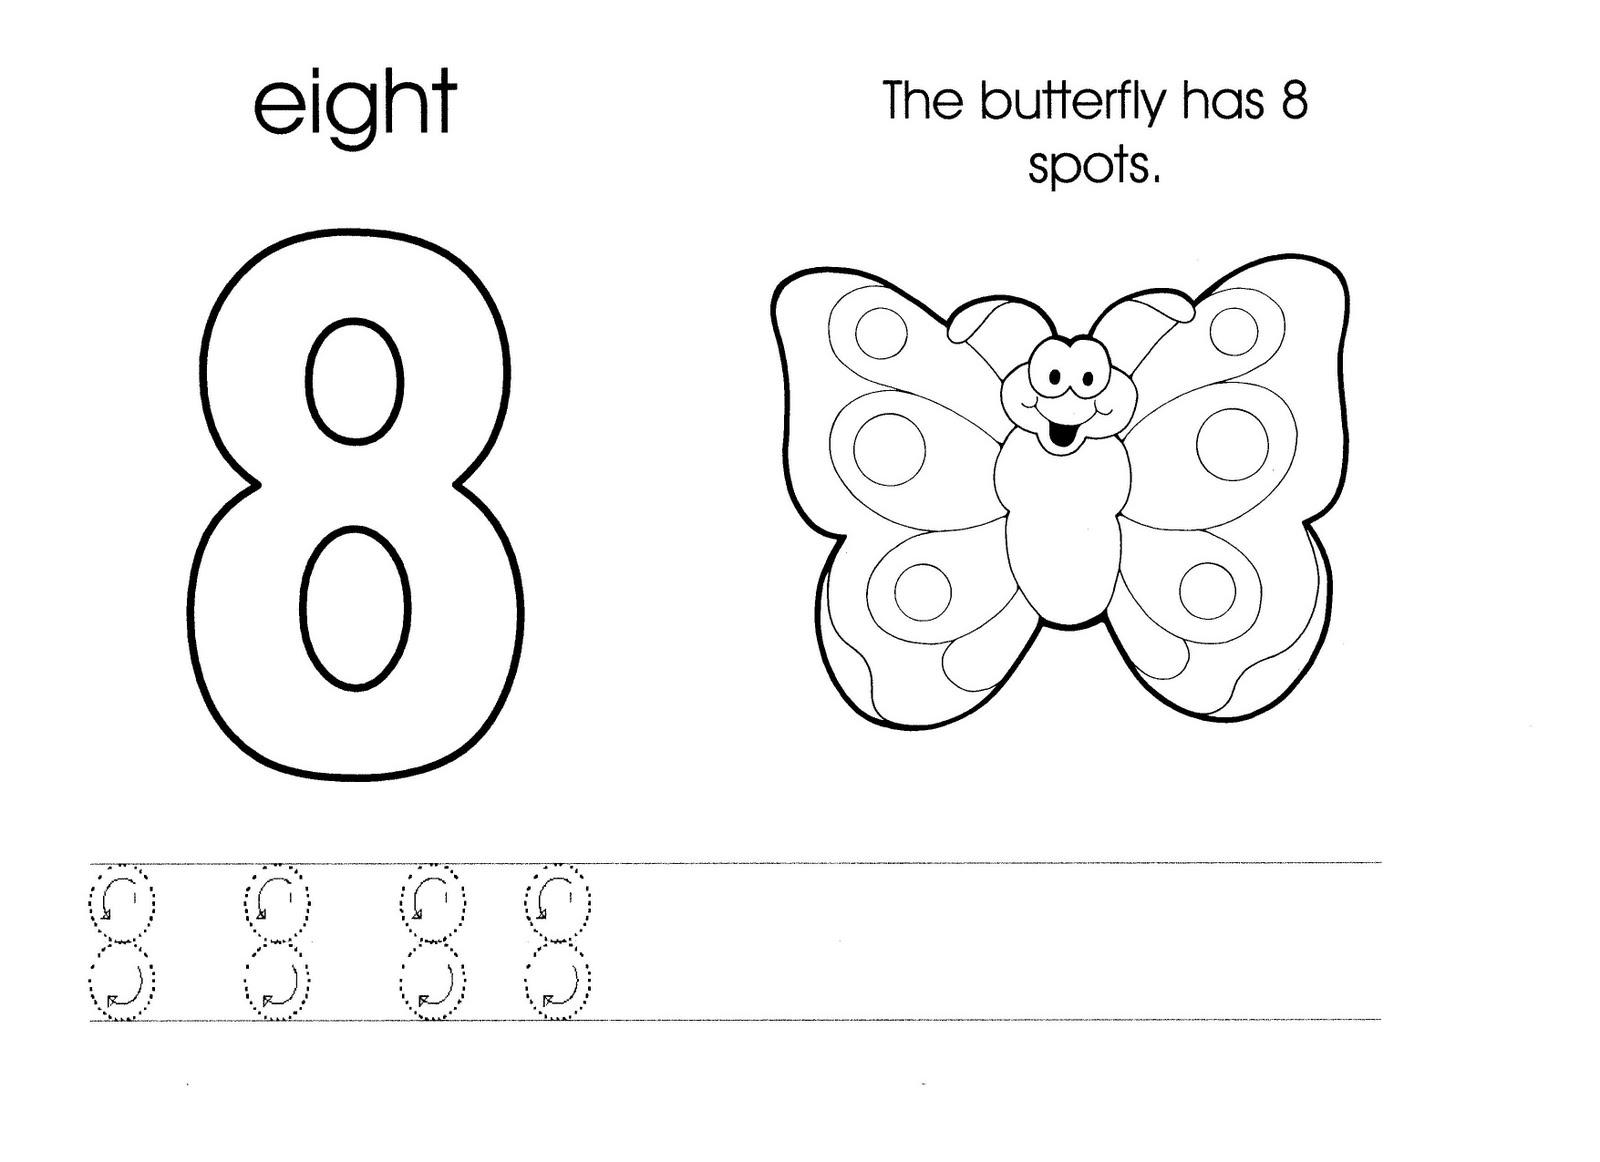 Preschool Playbook: Adding 6, 7, And 8